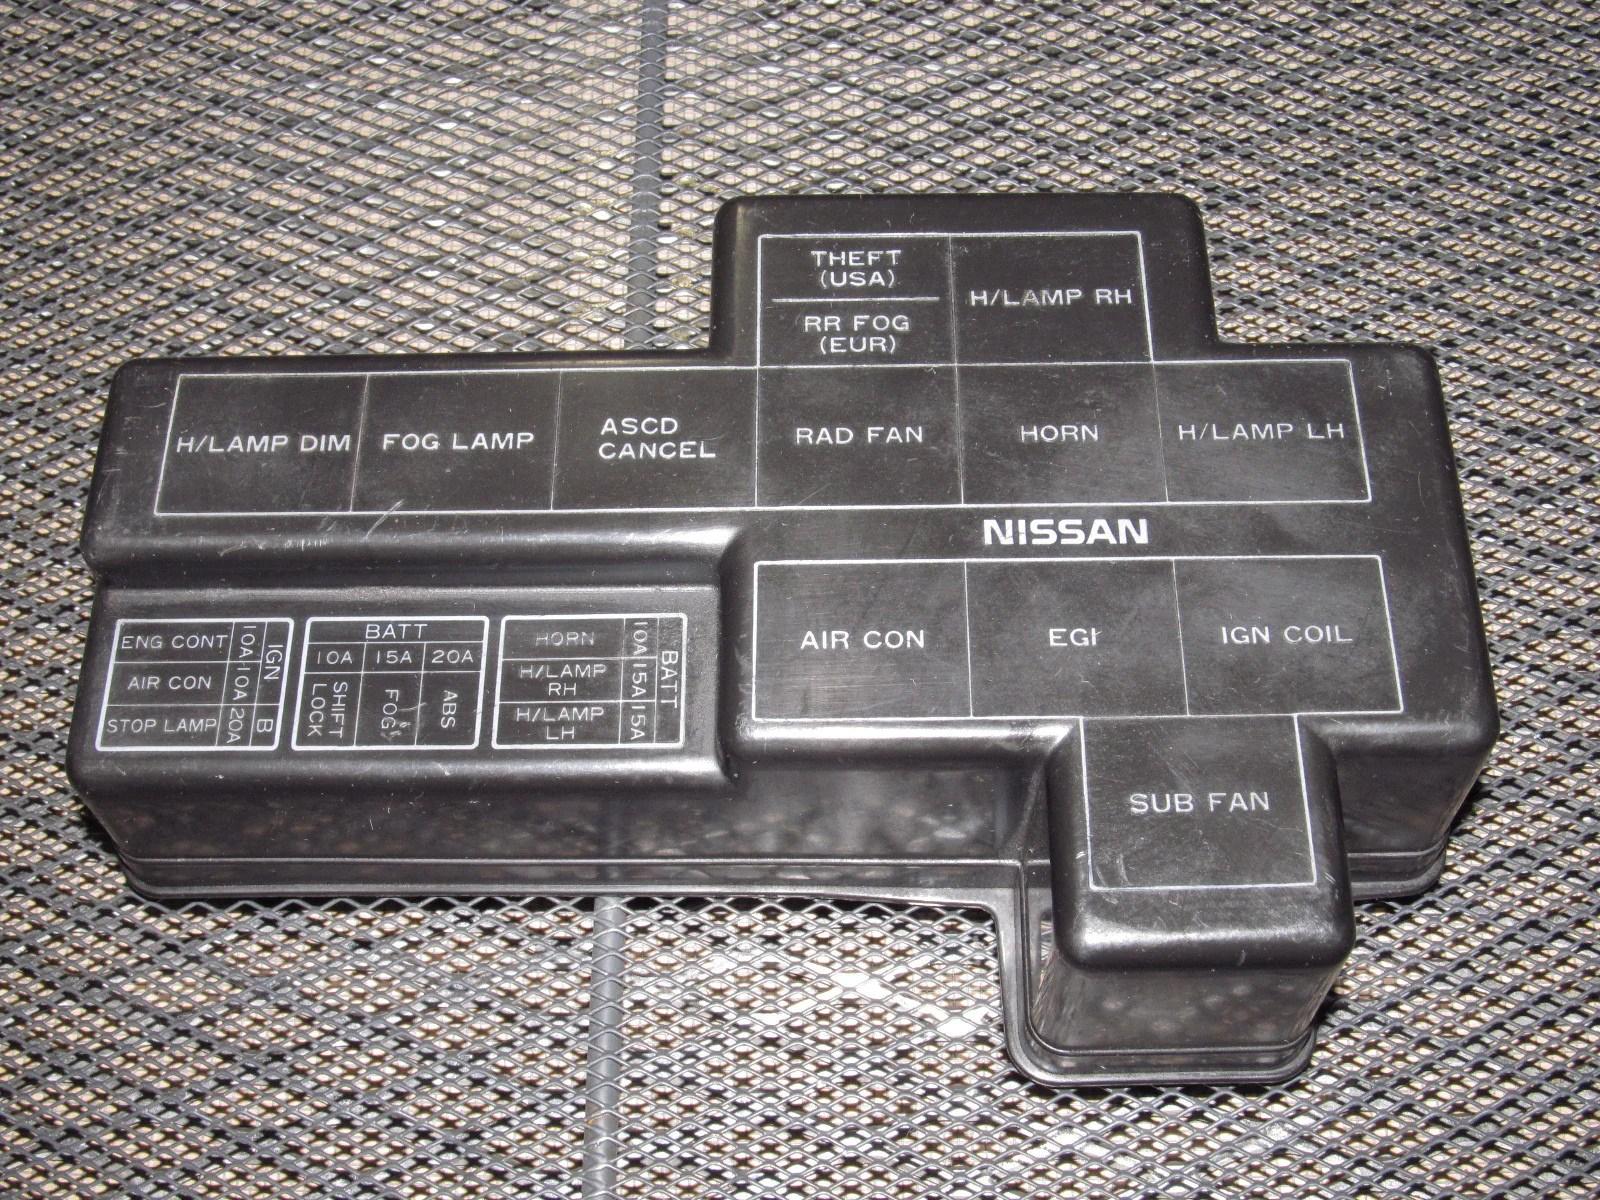 85 300zx fuse box wiring diagram 85 nissan 300zx fuse box diagram [ 1600 x 1200 Pixel ]